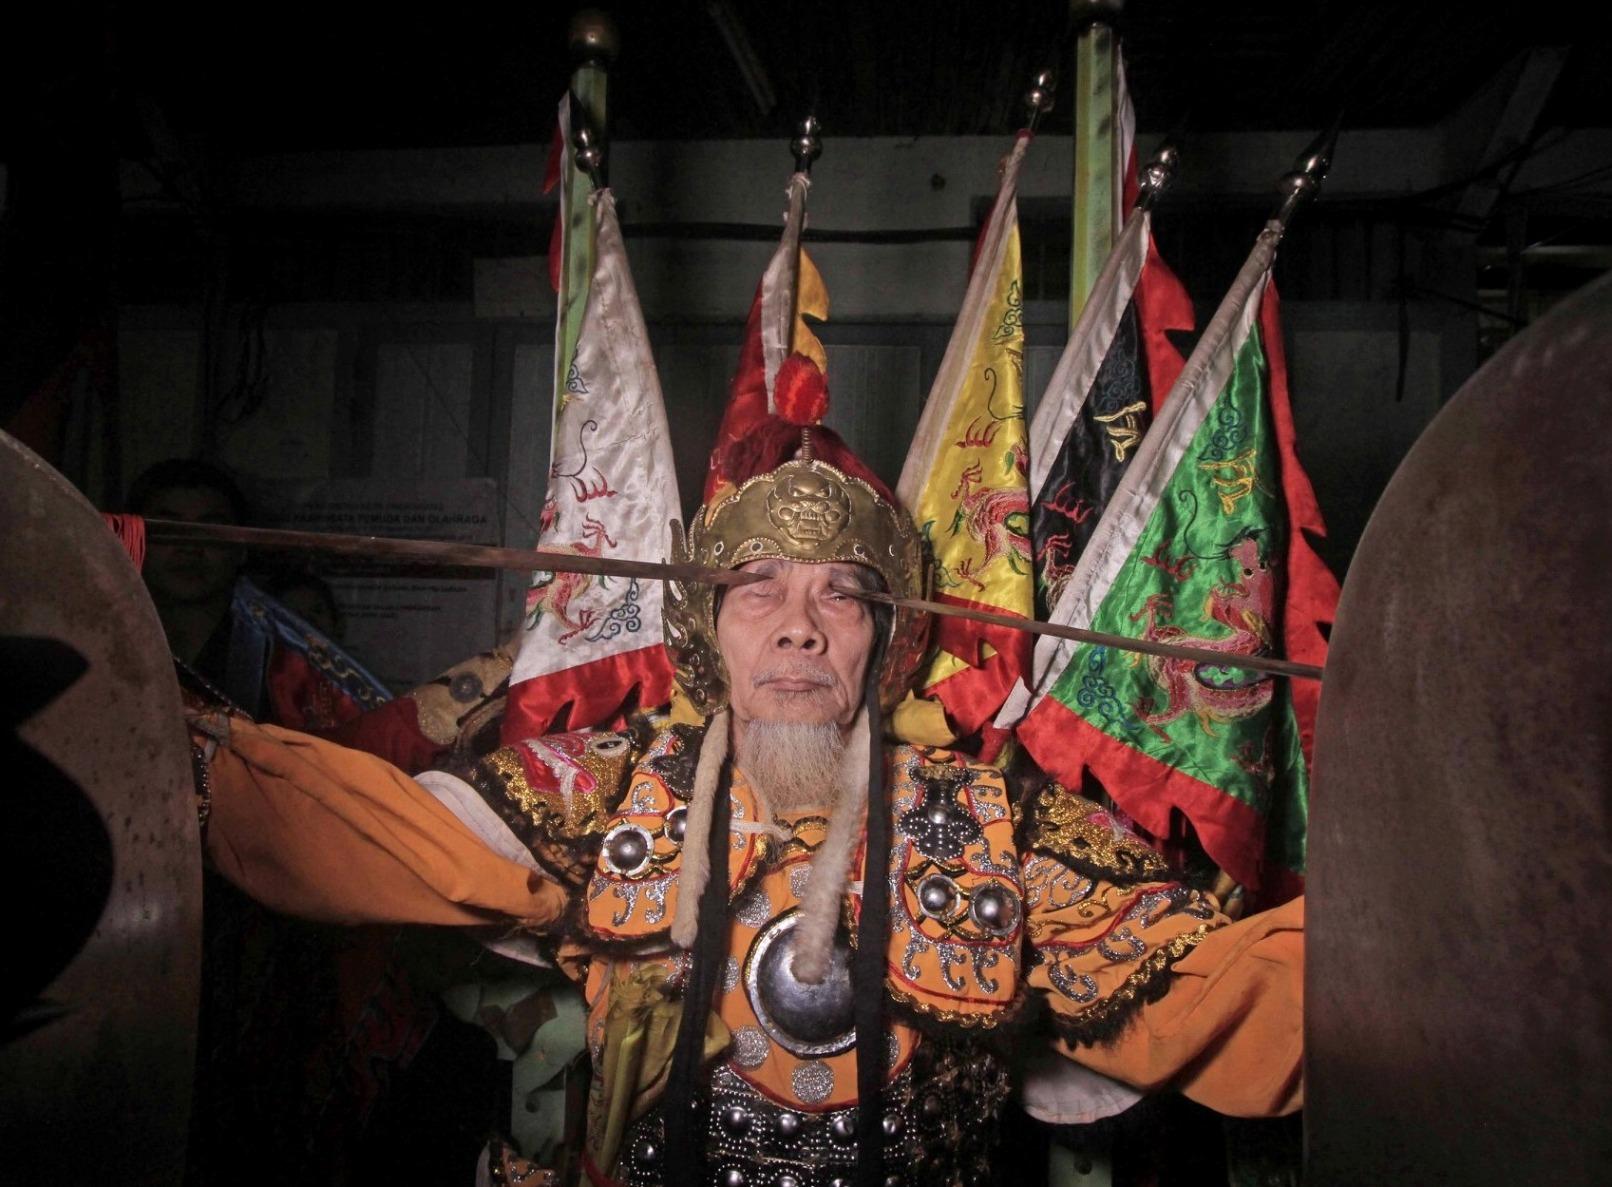 tionghoa, Tatung, medium, shaman, dukun, spiritual, wisata budaya, Cap Go Meh, authentic, Indonesia, tourist attraction, travel guide, cross border, 探索婆罗洲游踪, 印尼山口洋乩童, 西加里曼丹元宵节,